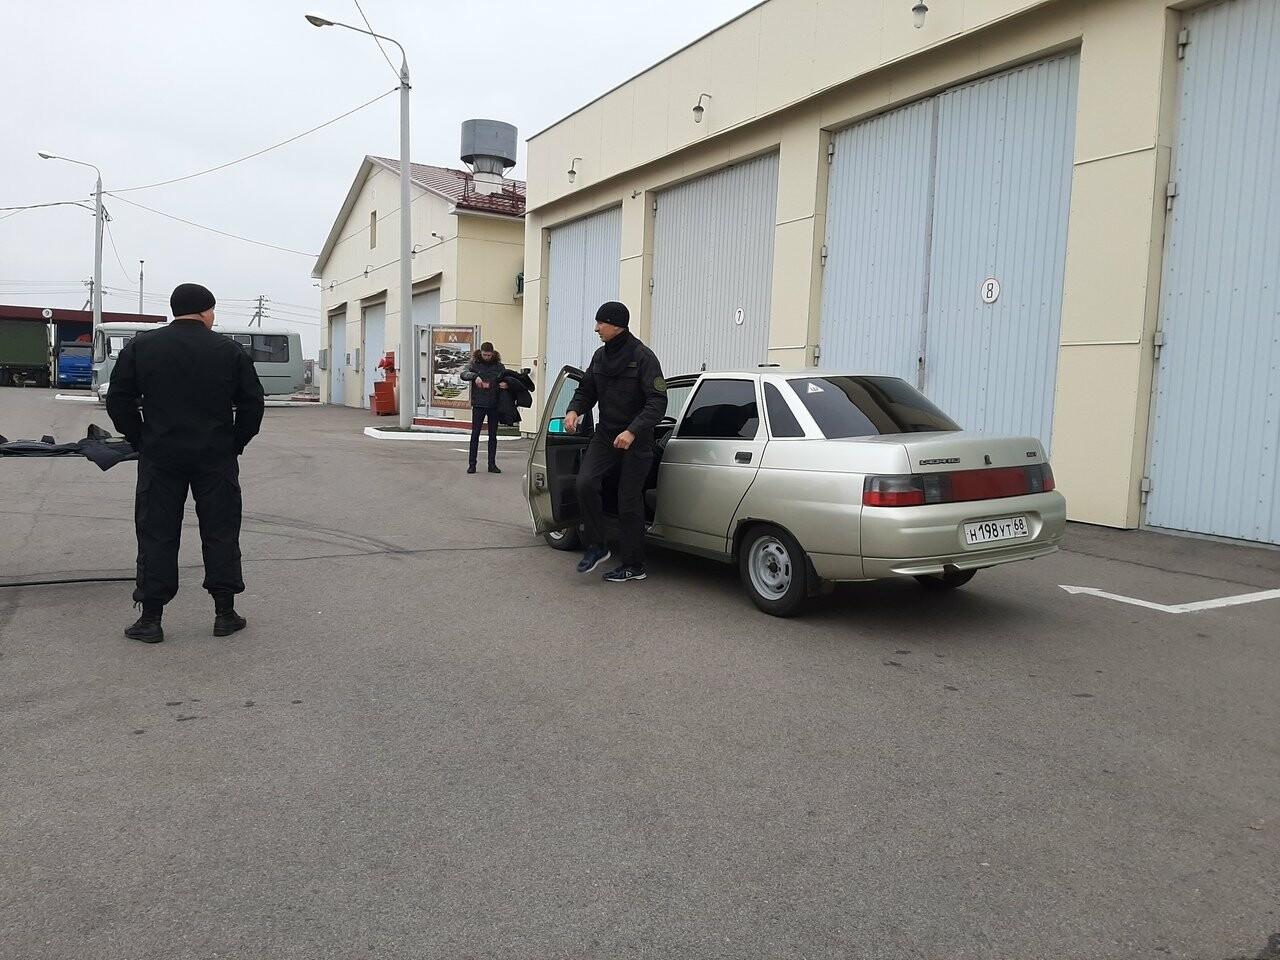 Постреляли и покатались на машине: как сотрудники тамбовских ЧОПов «выясняли отношения», фото-2